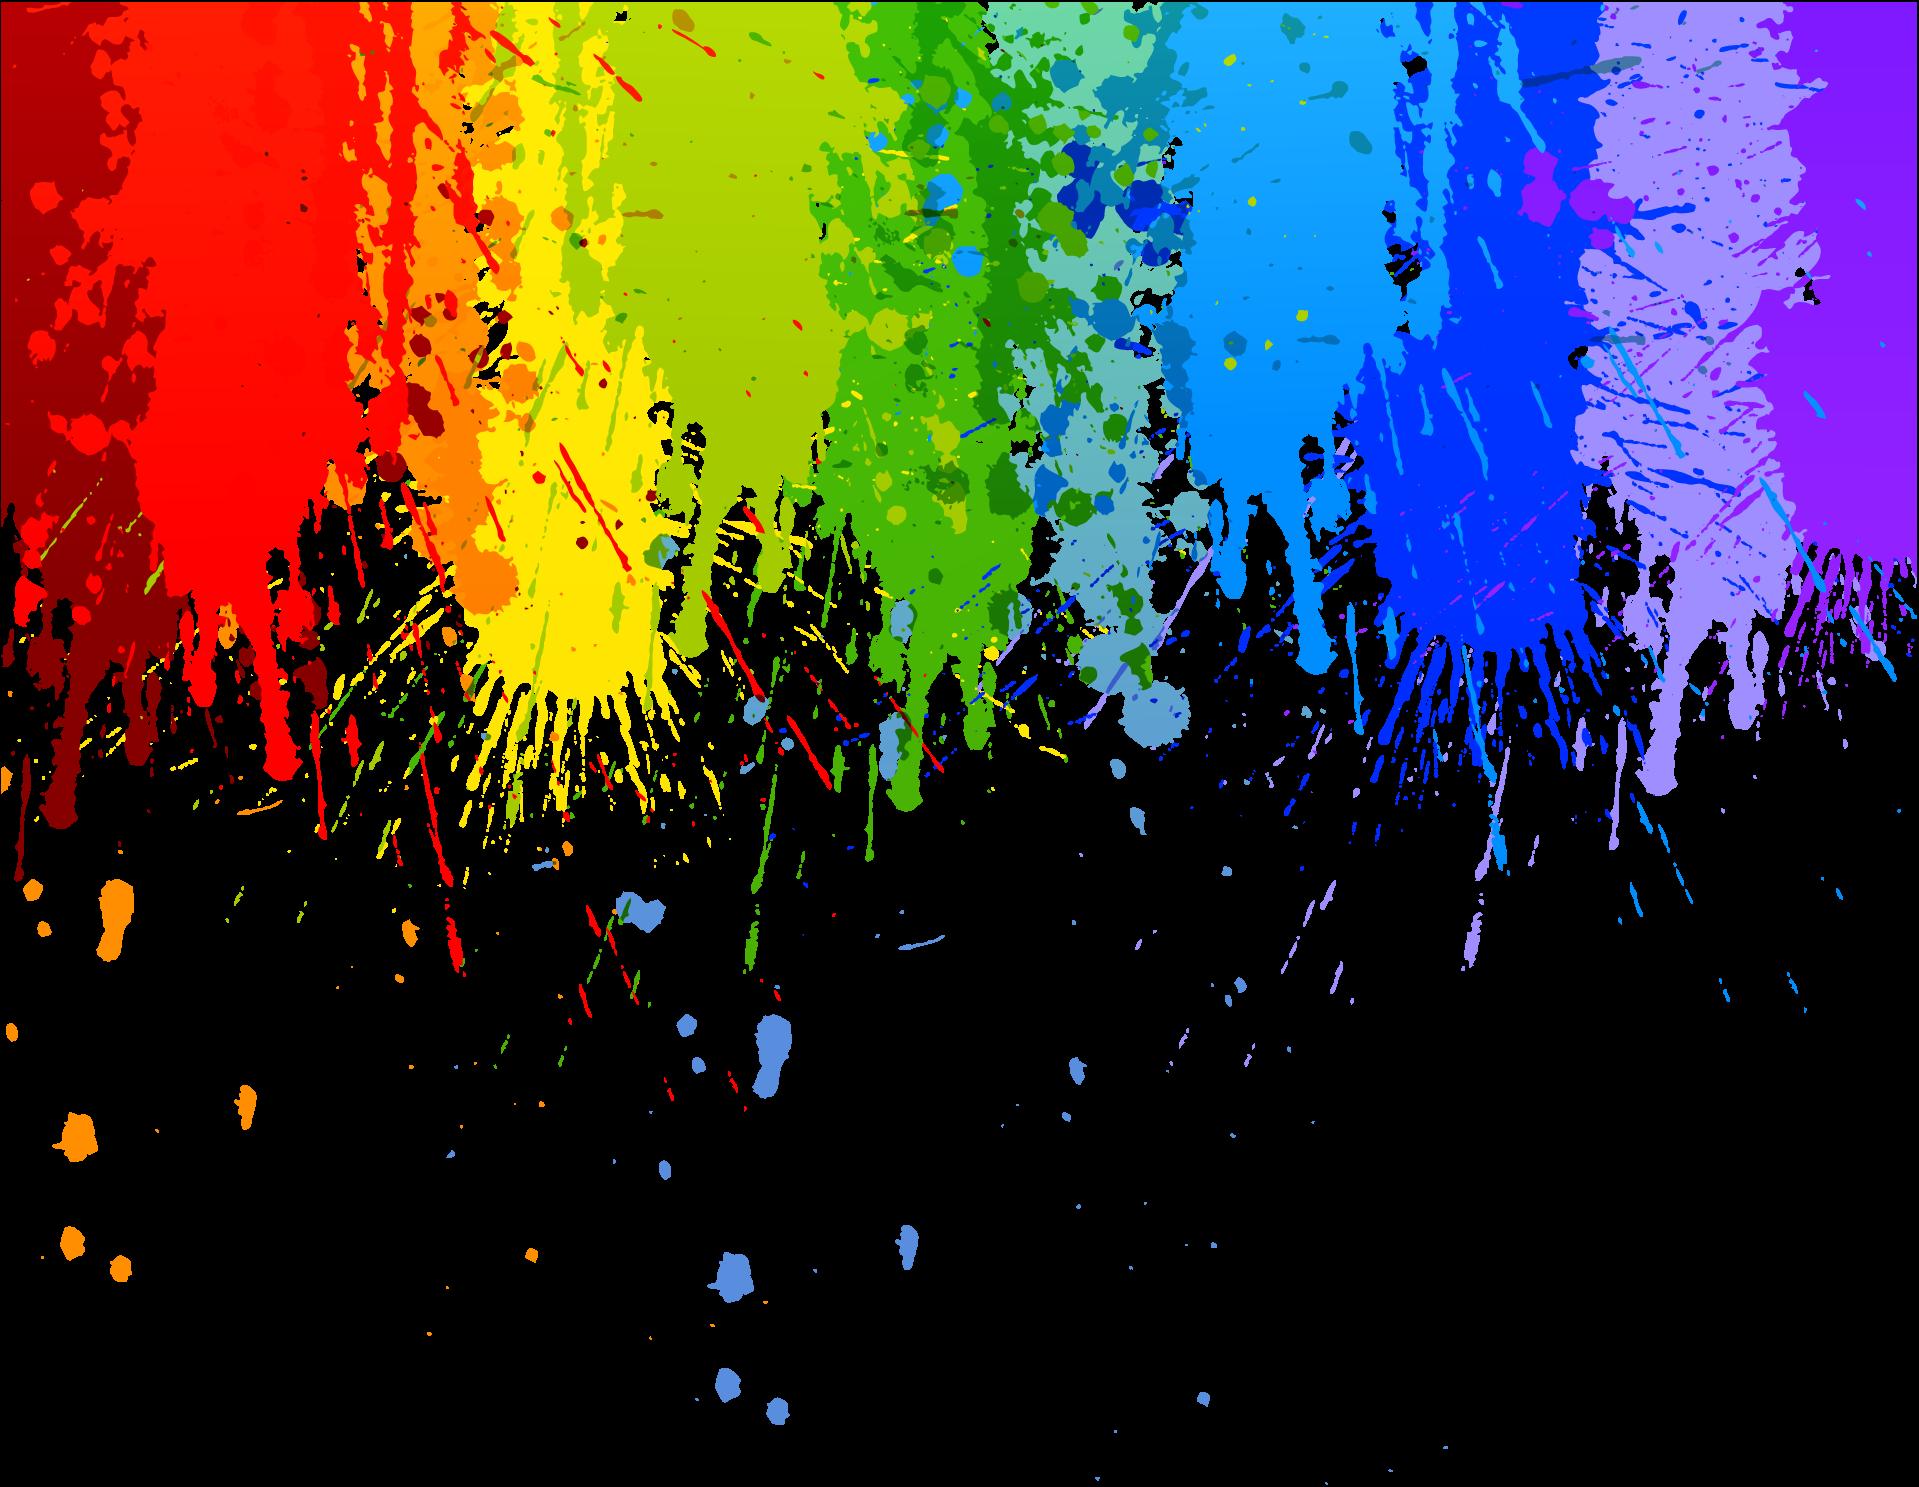 Colour splash drip transparent. Clipart rainbow brush stroke